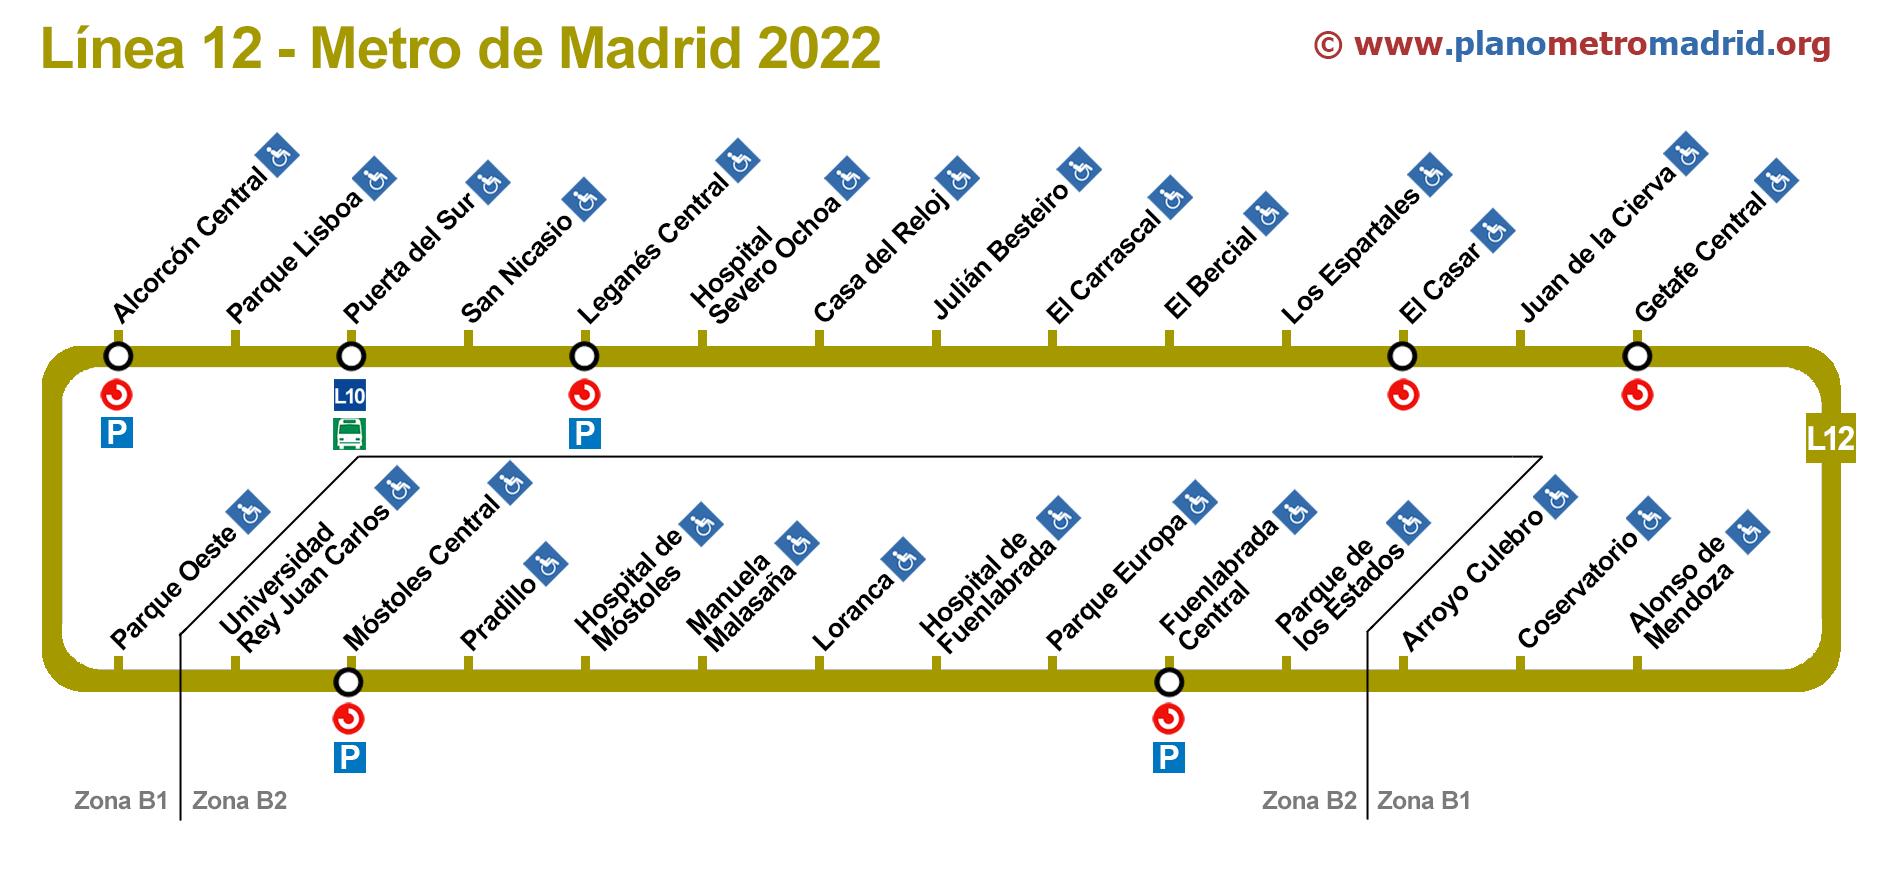 Central Subway Map.Line 12 Subway Madrid Metrosur L12 Updated 2019